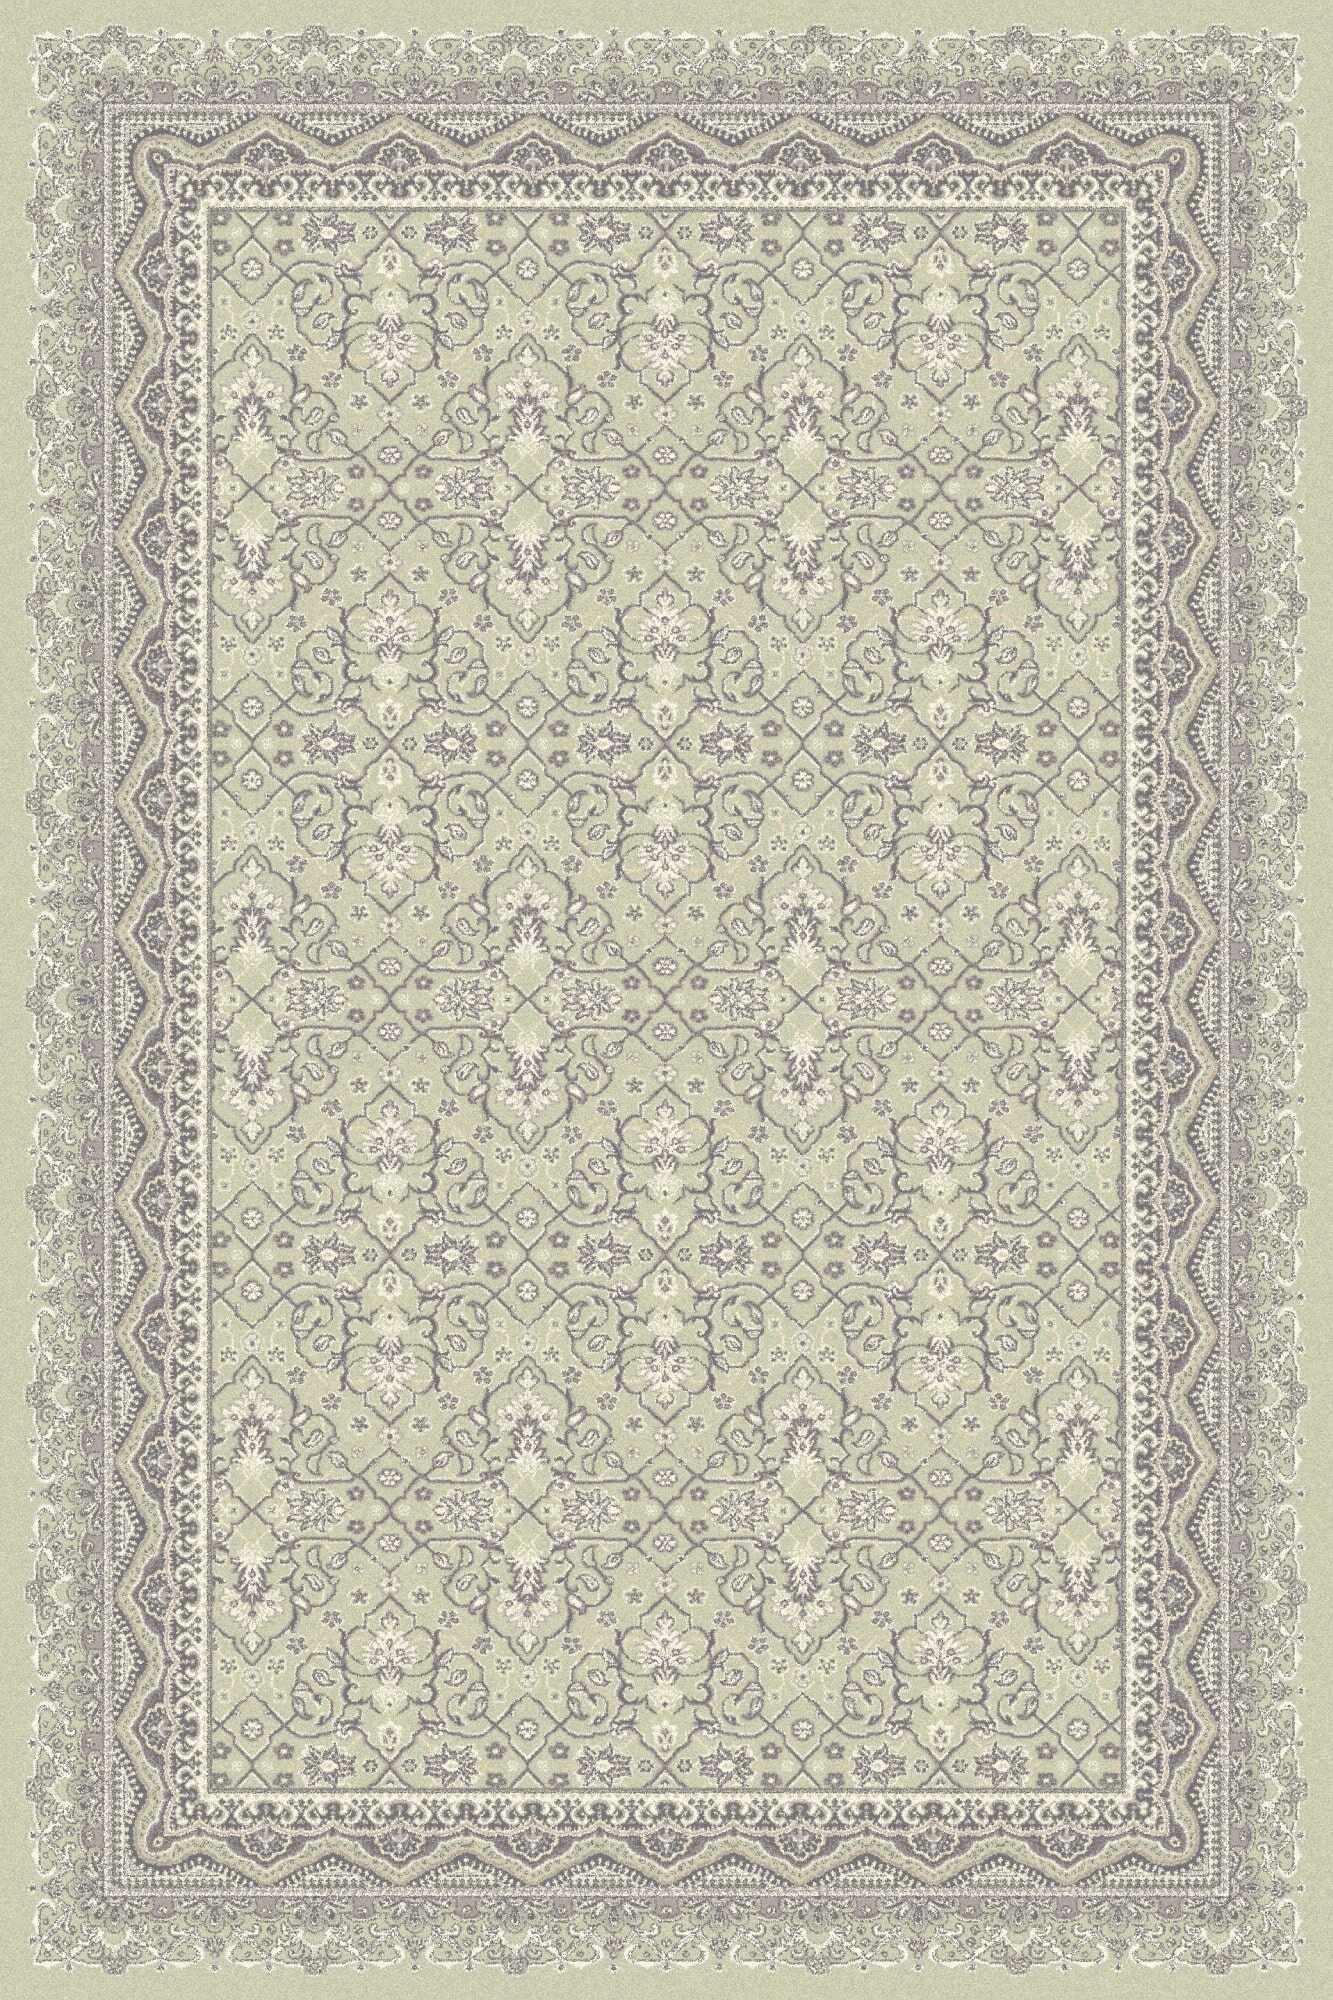 Covor din lana Garda Verde Mint, Wilton la pret 1289 lei